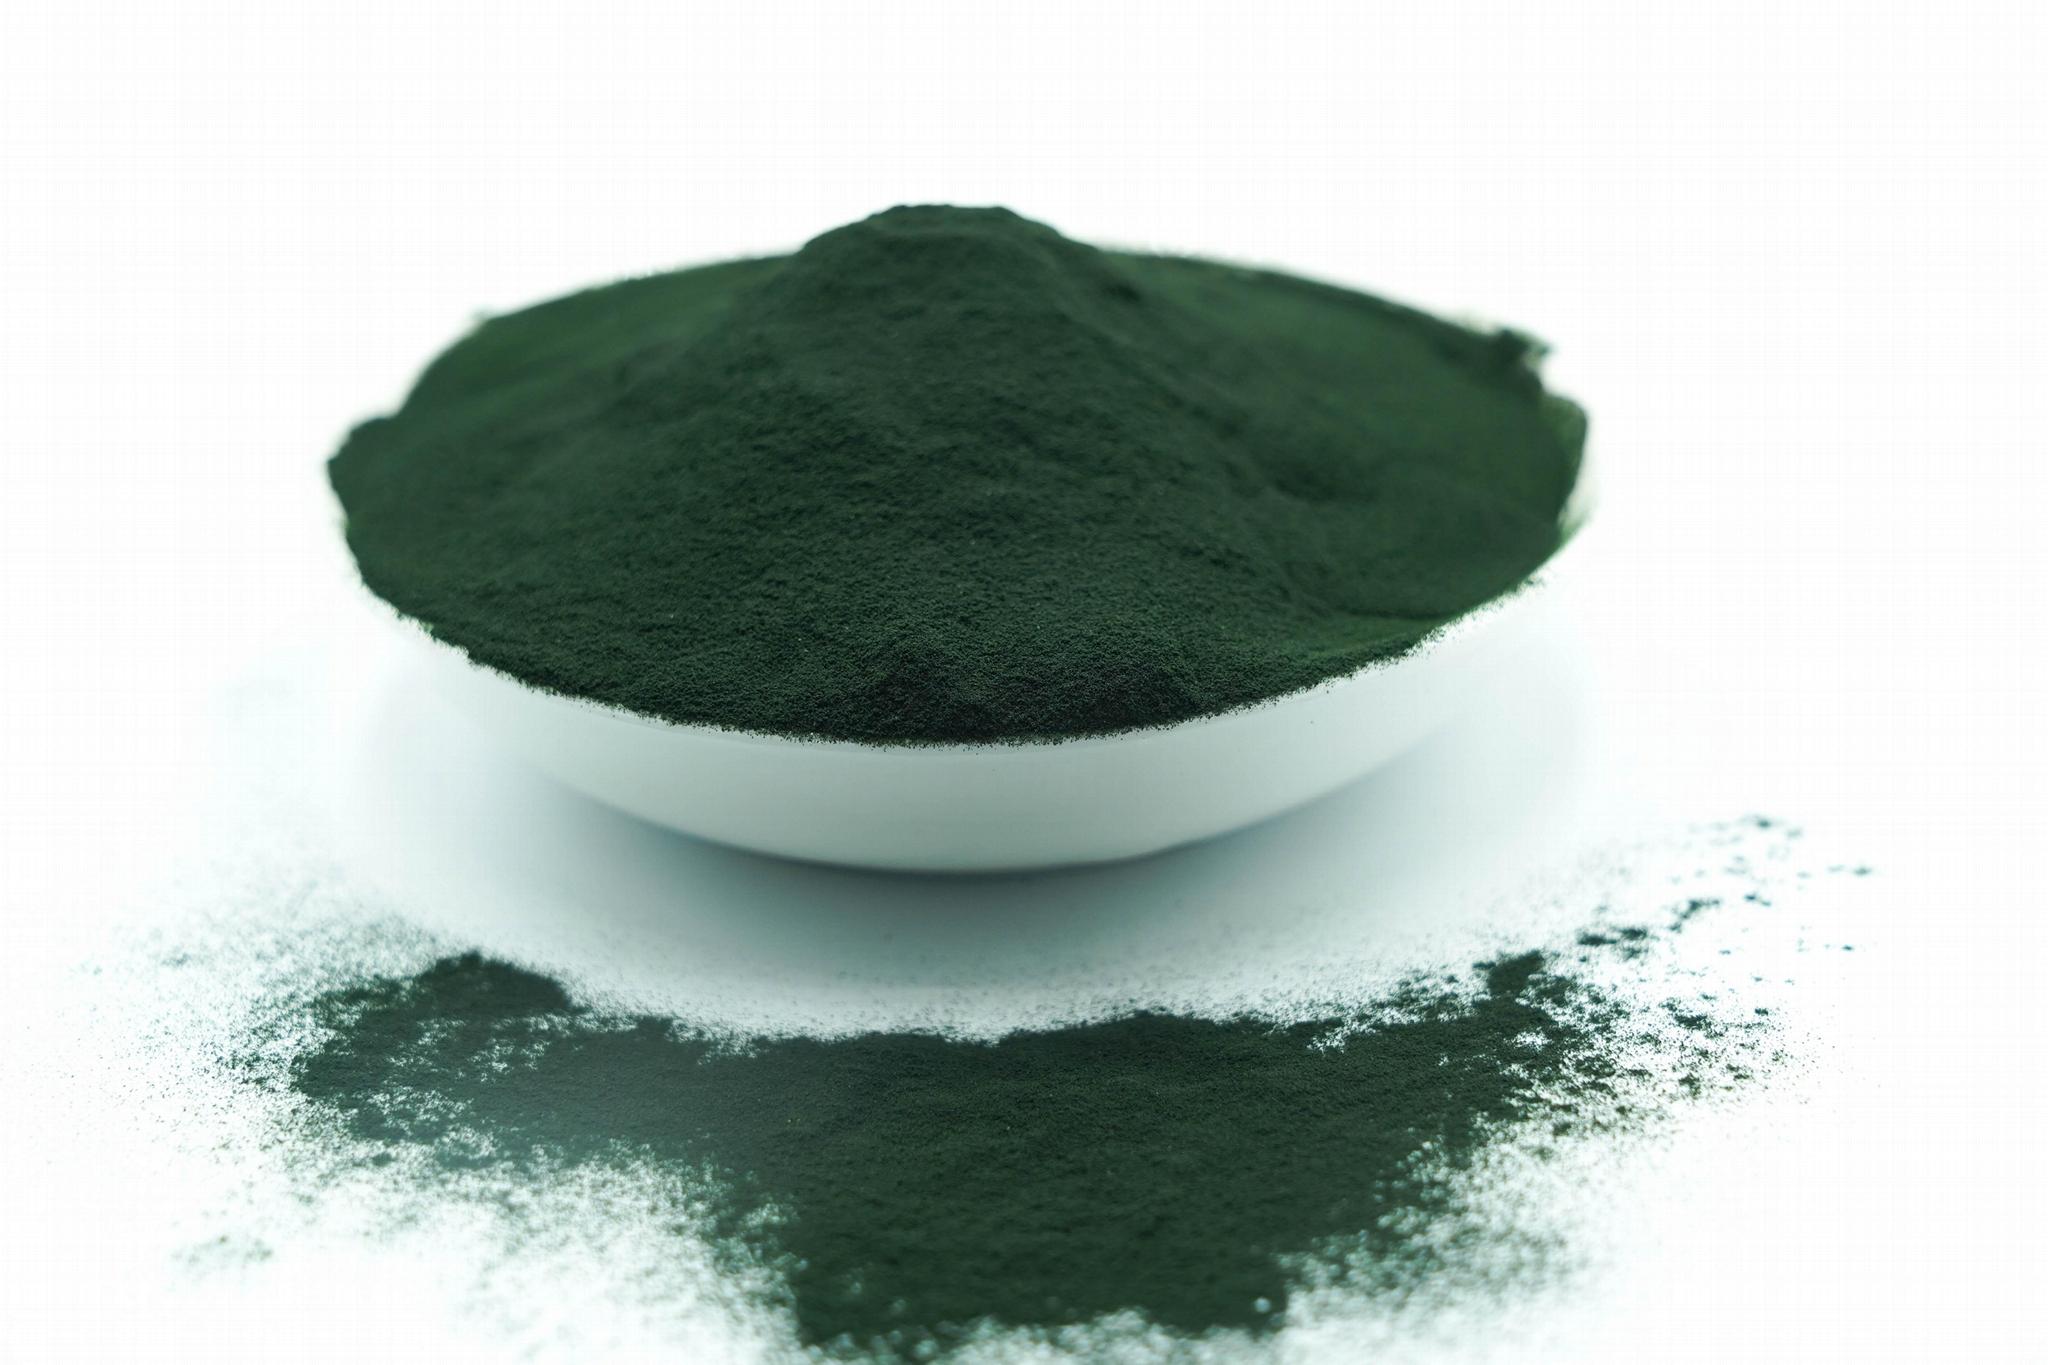 Price Of Spirulina Per Ton Spirulina Powder Spirulina Extract 1